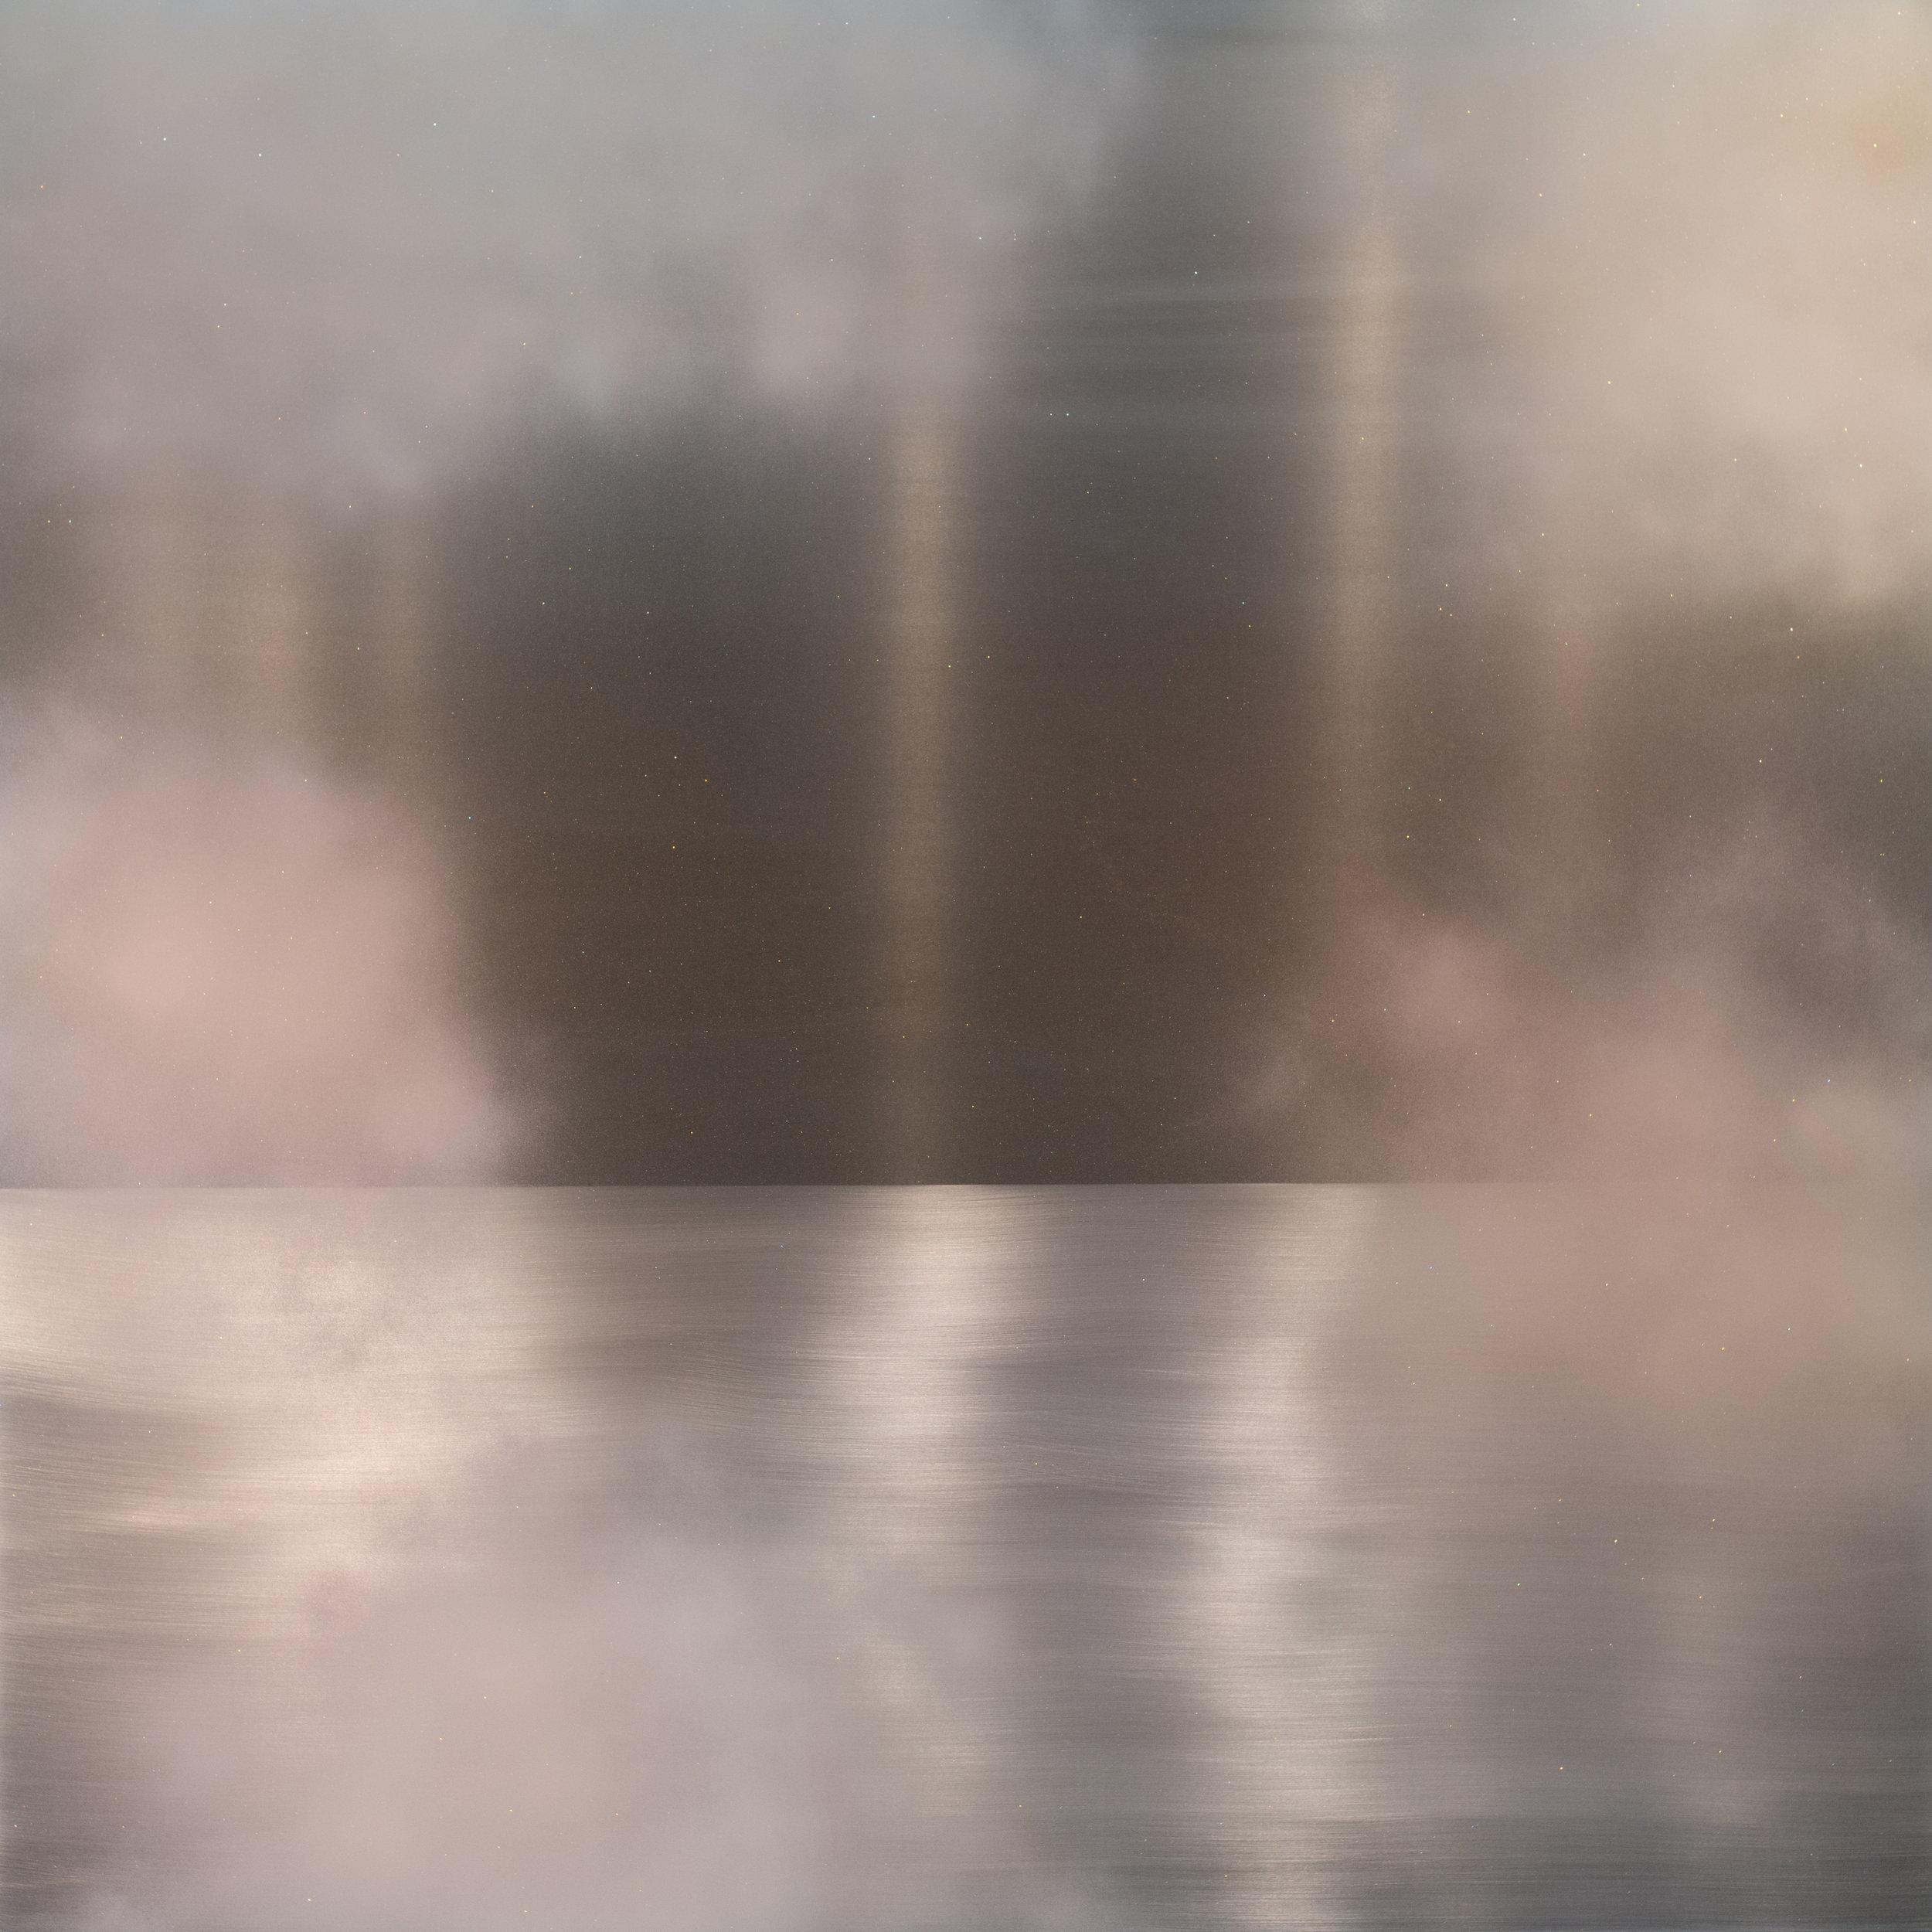 Miya Ando  Tasogare (Twilight) Peach Pink Yellow , 2018 Pigment, urethane, silver, mineral dust, dye, resin, aluminum 152.4 x 152.4 cm 60 x 60 in Photo: © Miya Ando Courtesy of the Artist